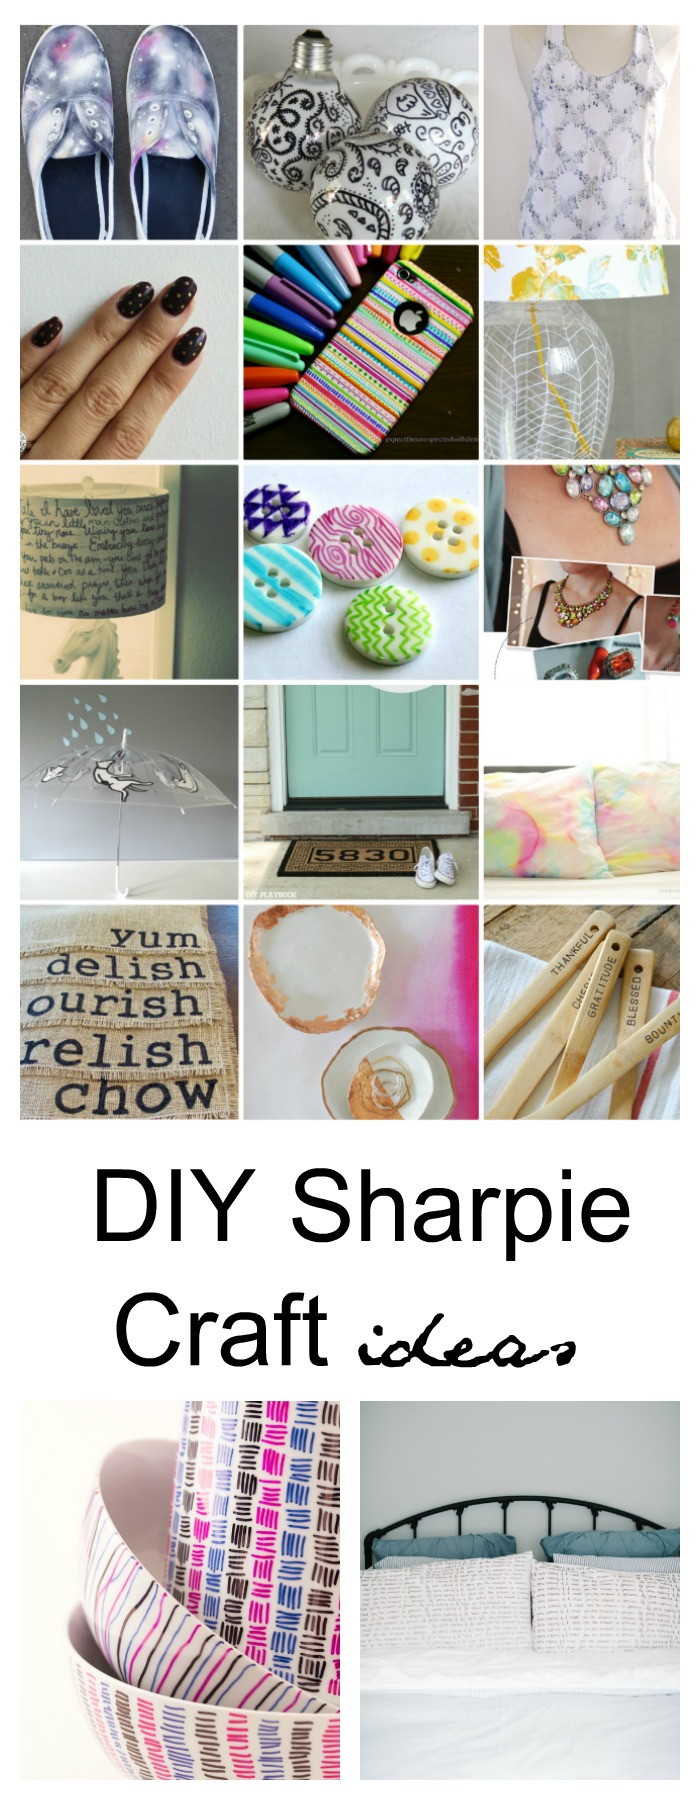 Craft ideas with sharpies - Diy Sharpie Craft Ideas Pin